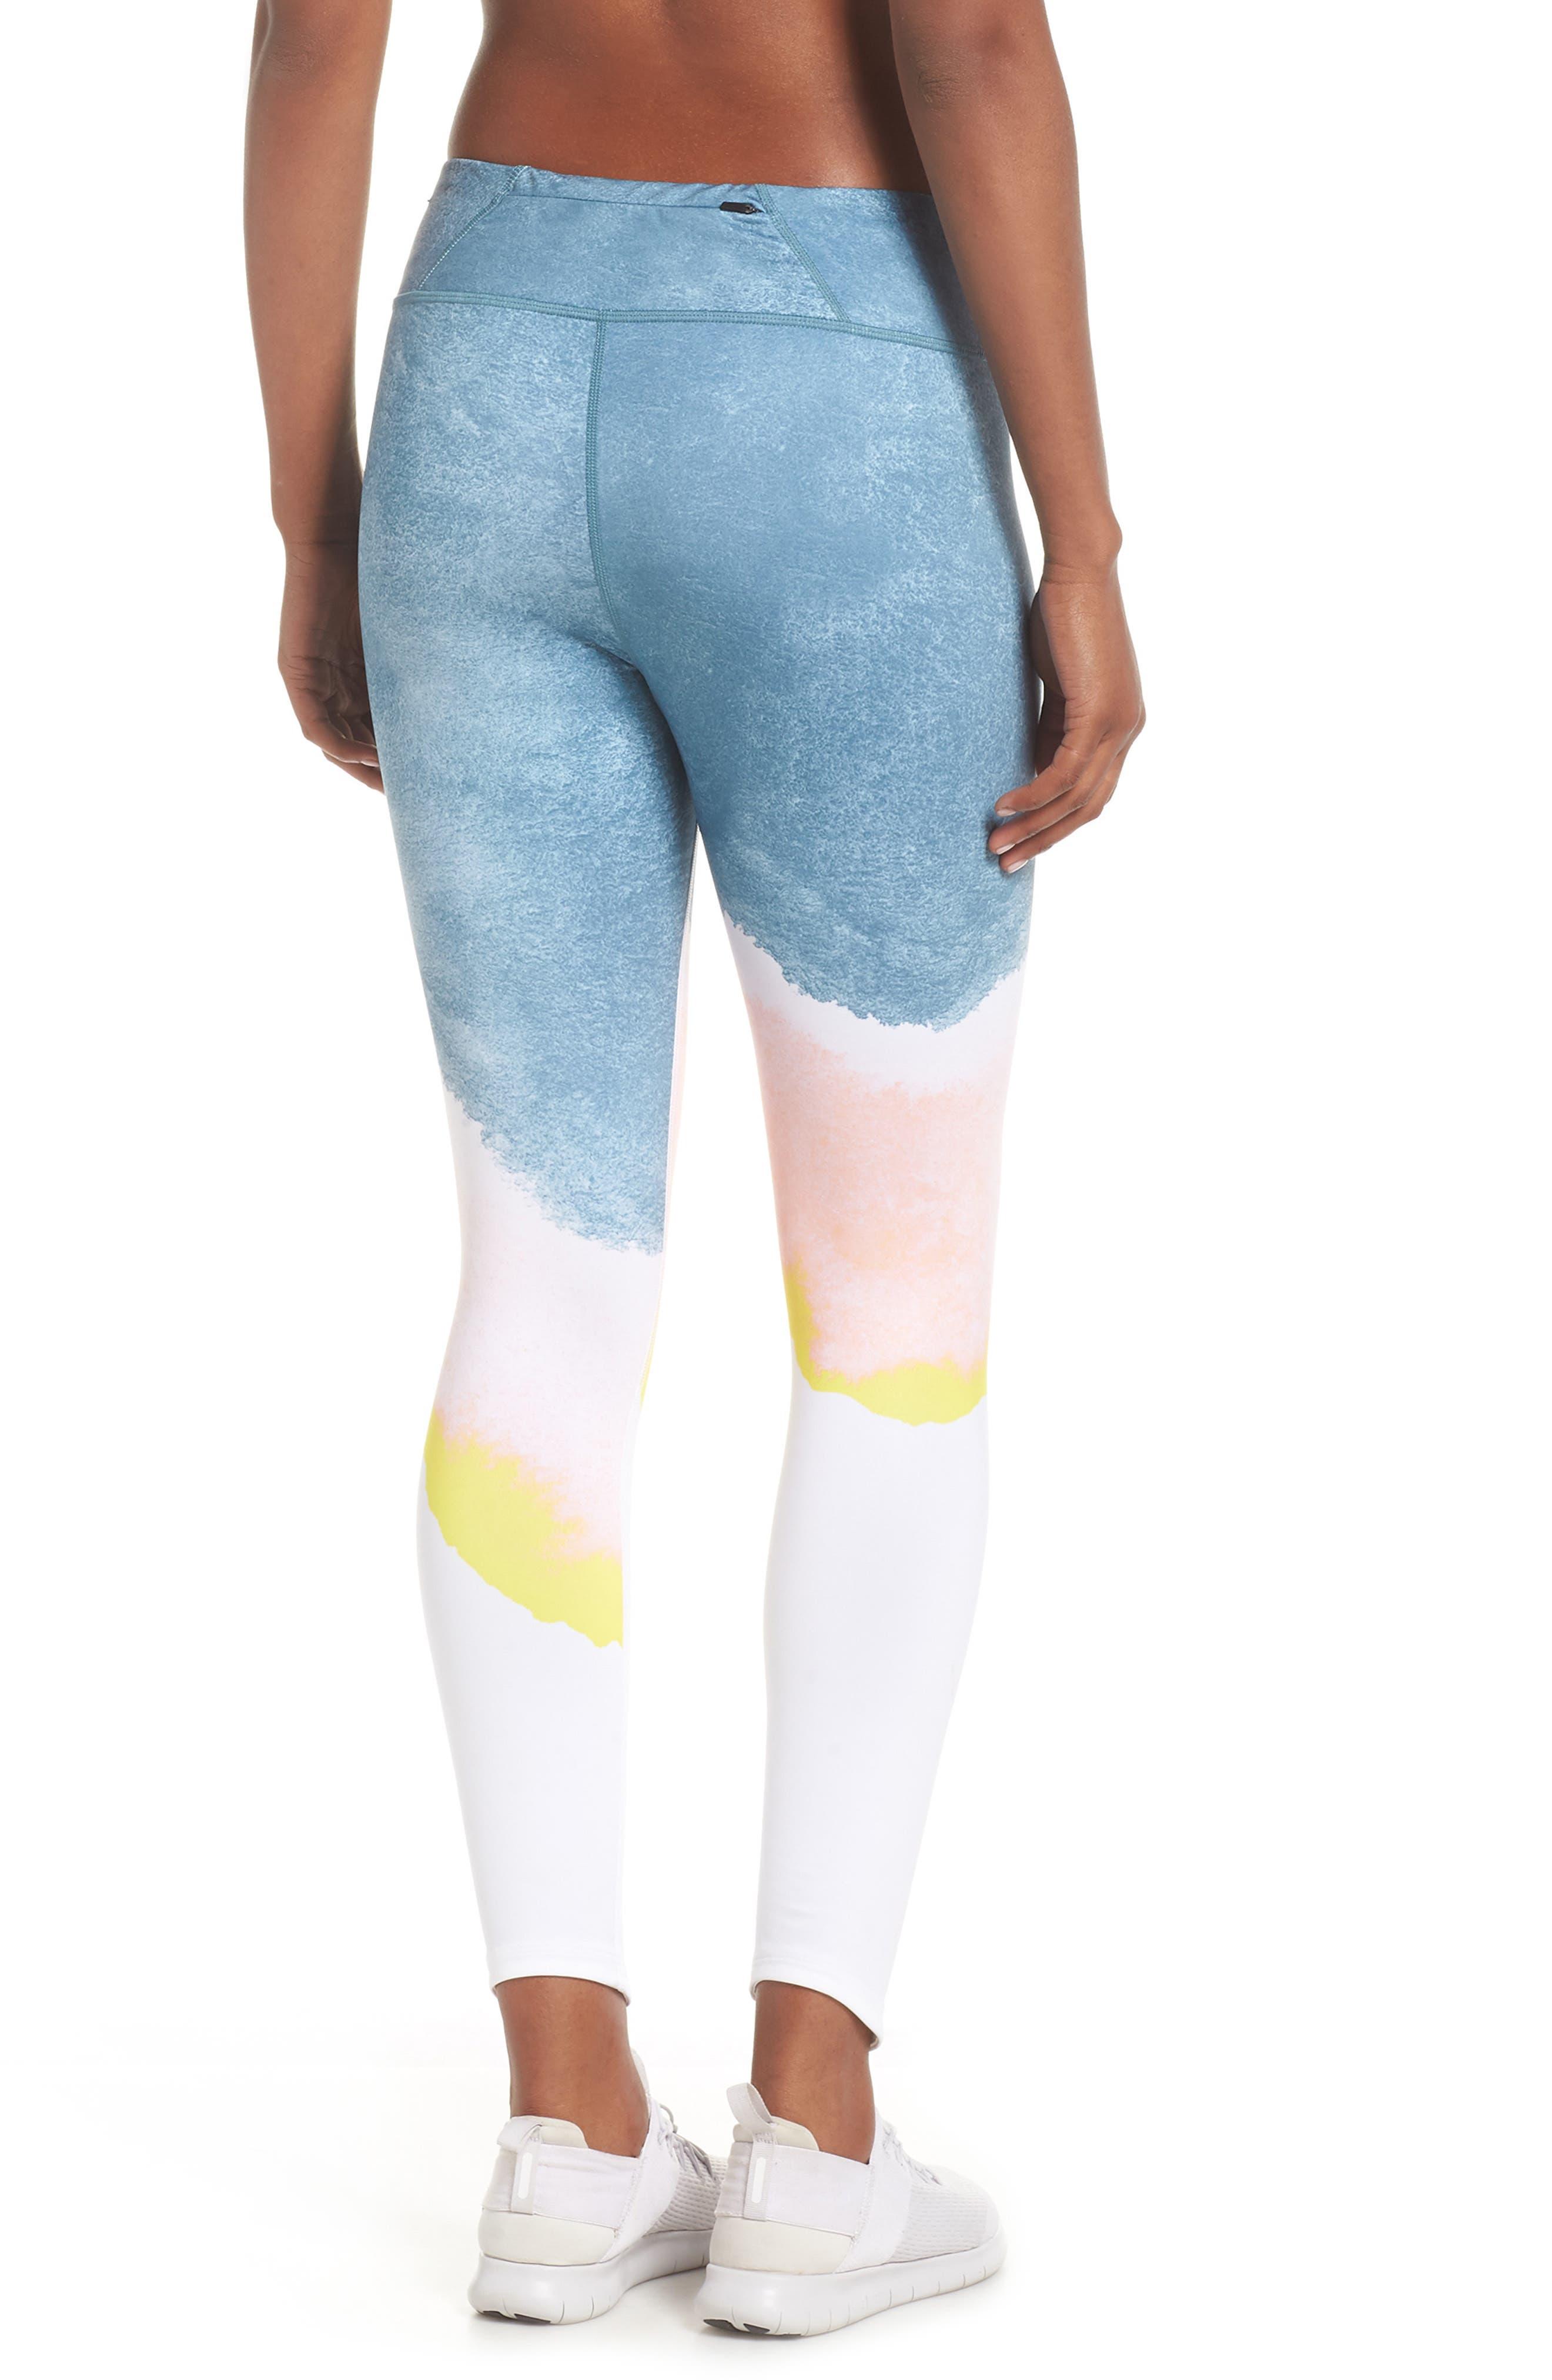 Epic Lux Running Leggings,                             Alternate thumbnail 2, color,                             WHITE/ STORM PINK/ GOLD